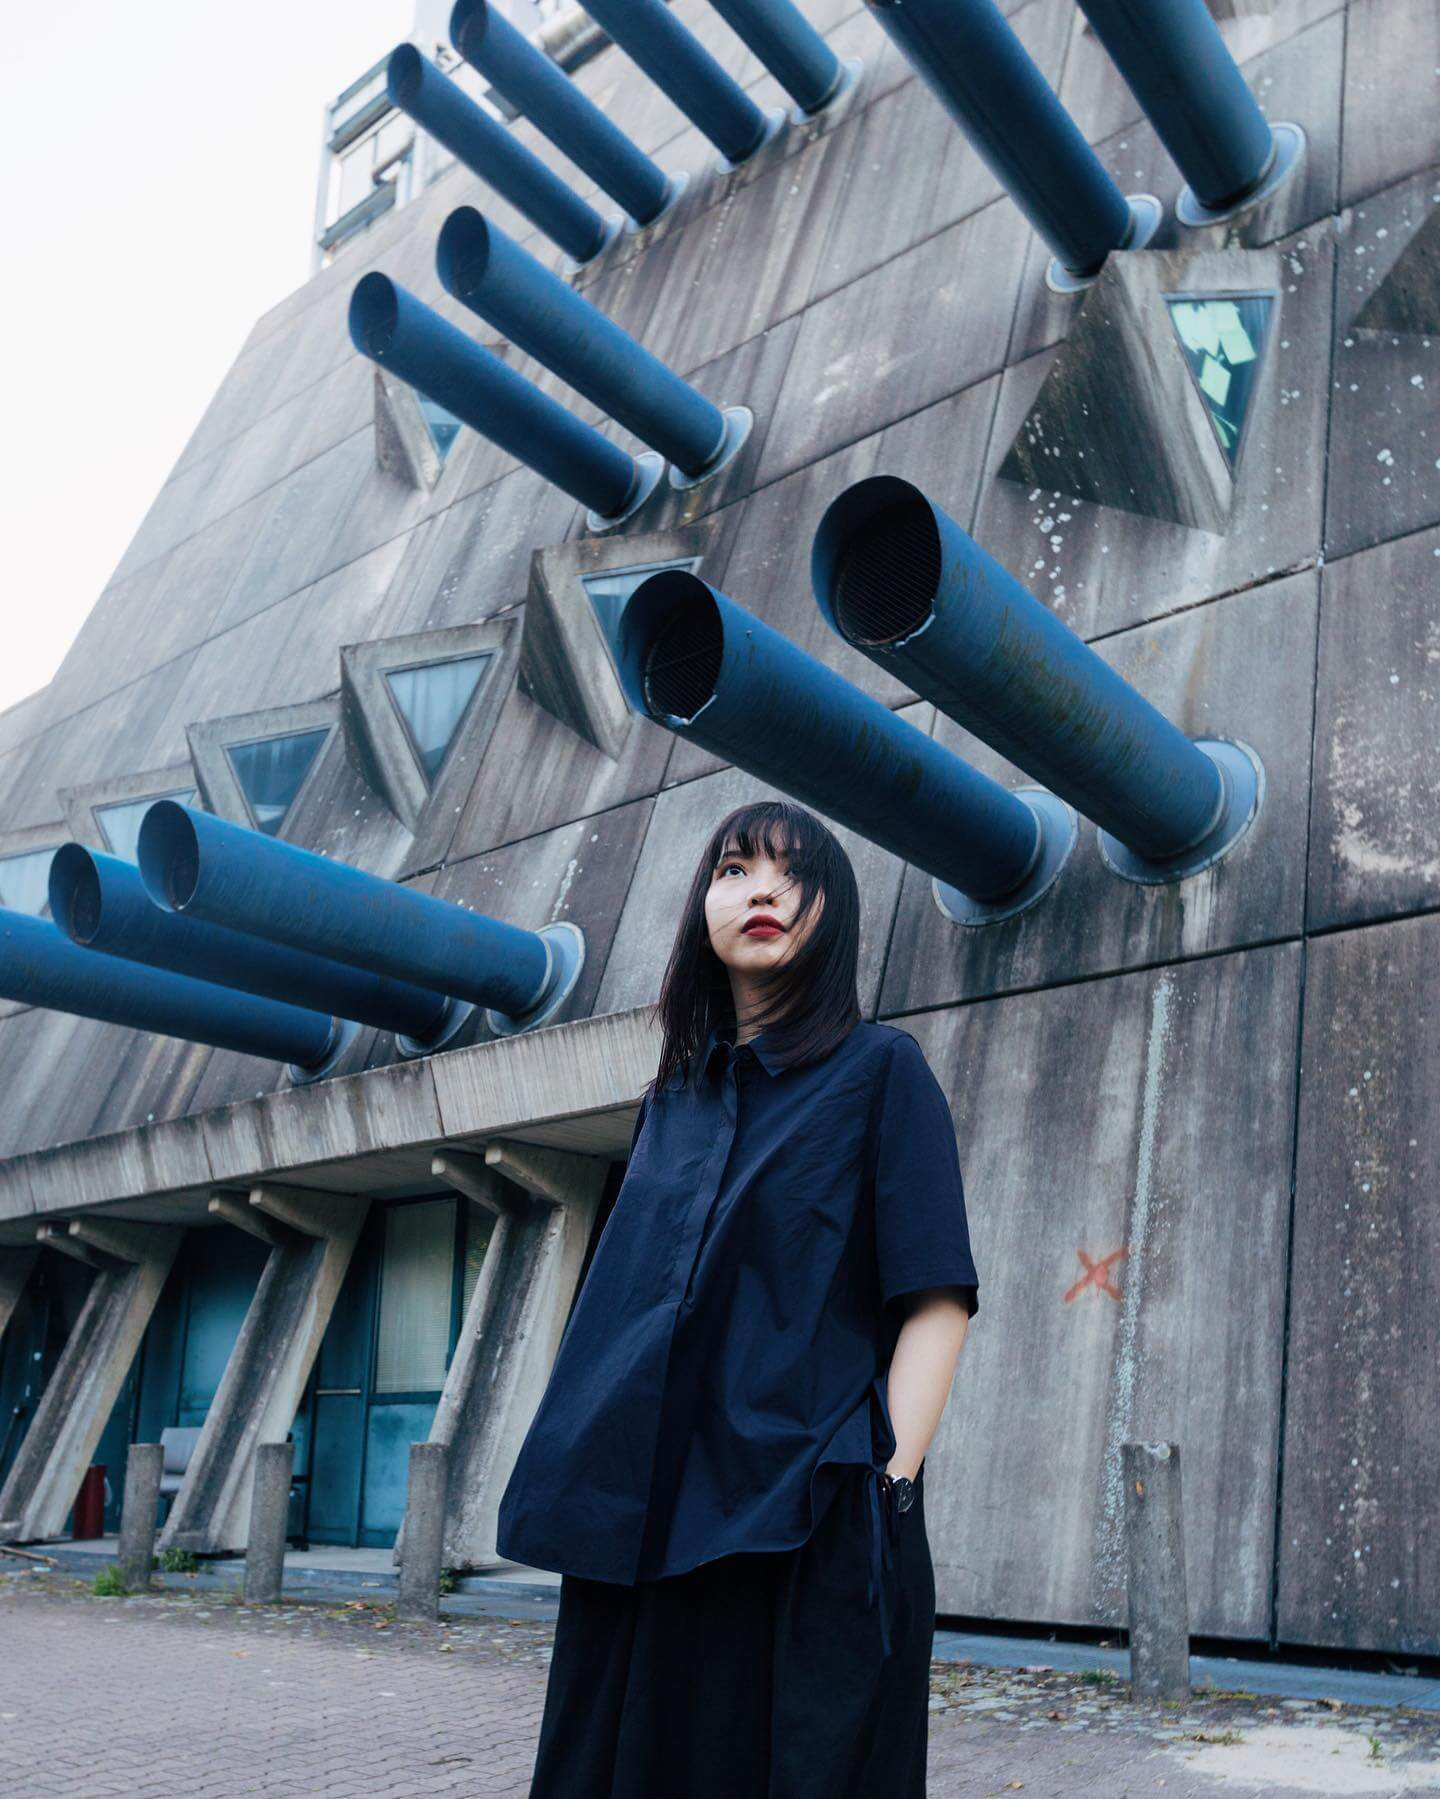 Brutalism architecture, blue architecture, model